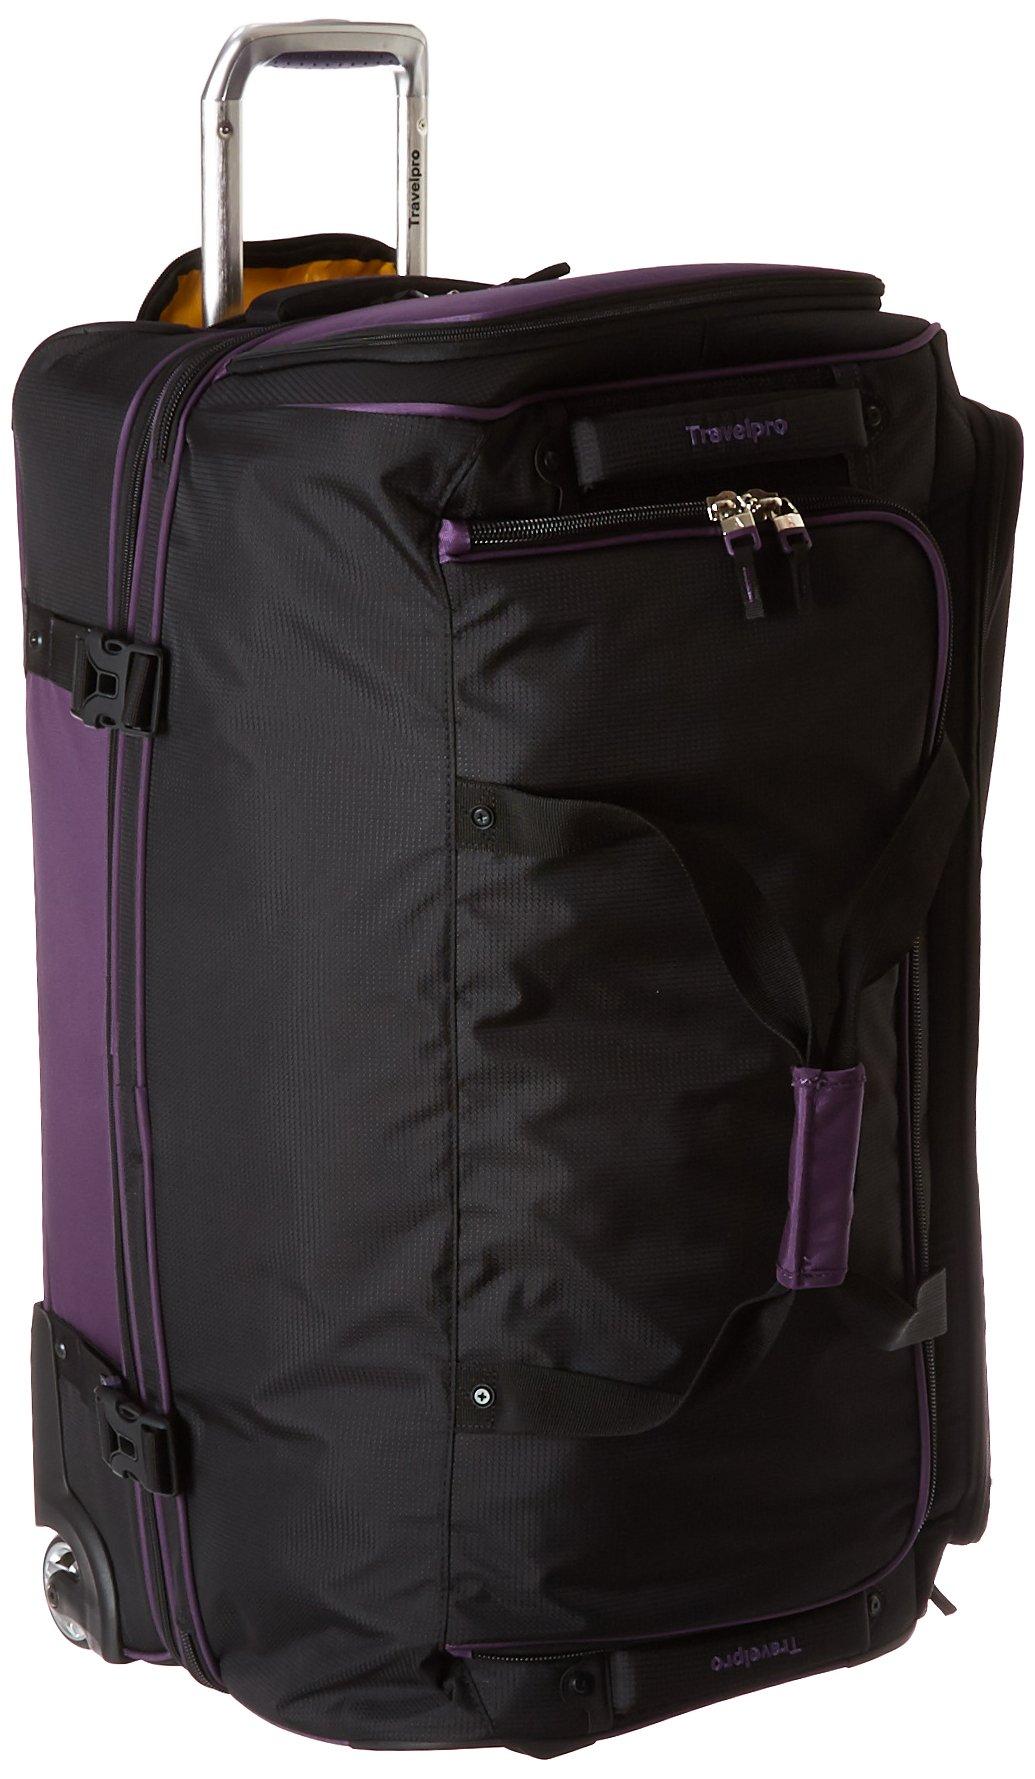 Travelpro Tpro Bold 2.0 30 Inch Drop Bottom Rolling Duffel, Black/Purple, One Size